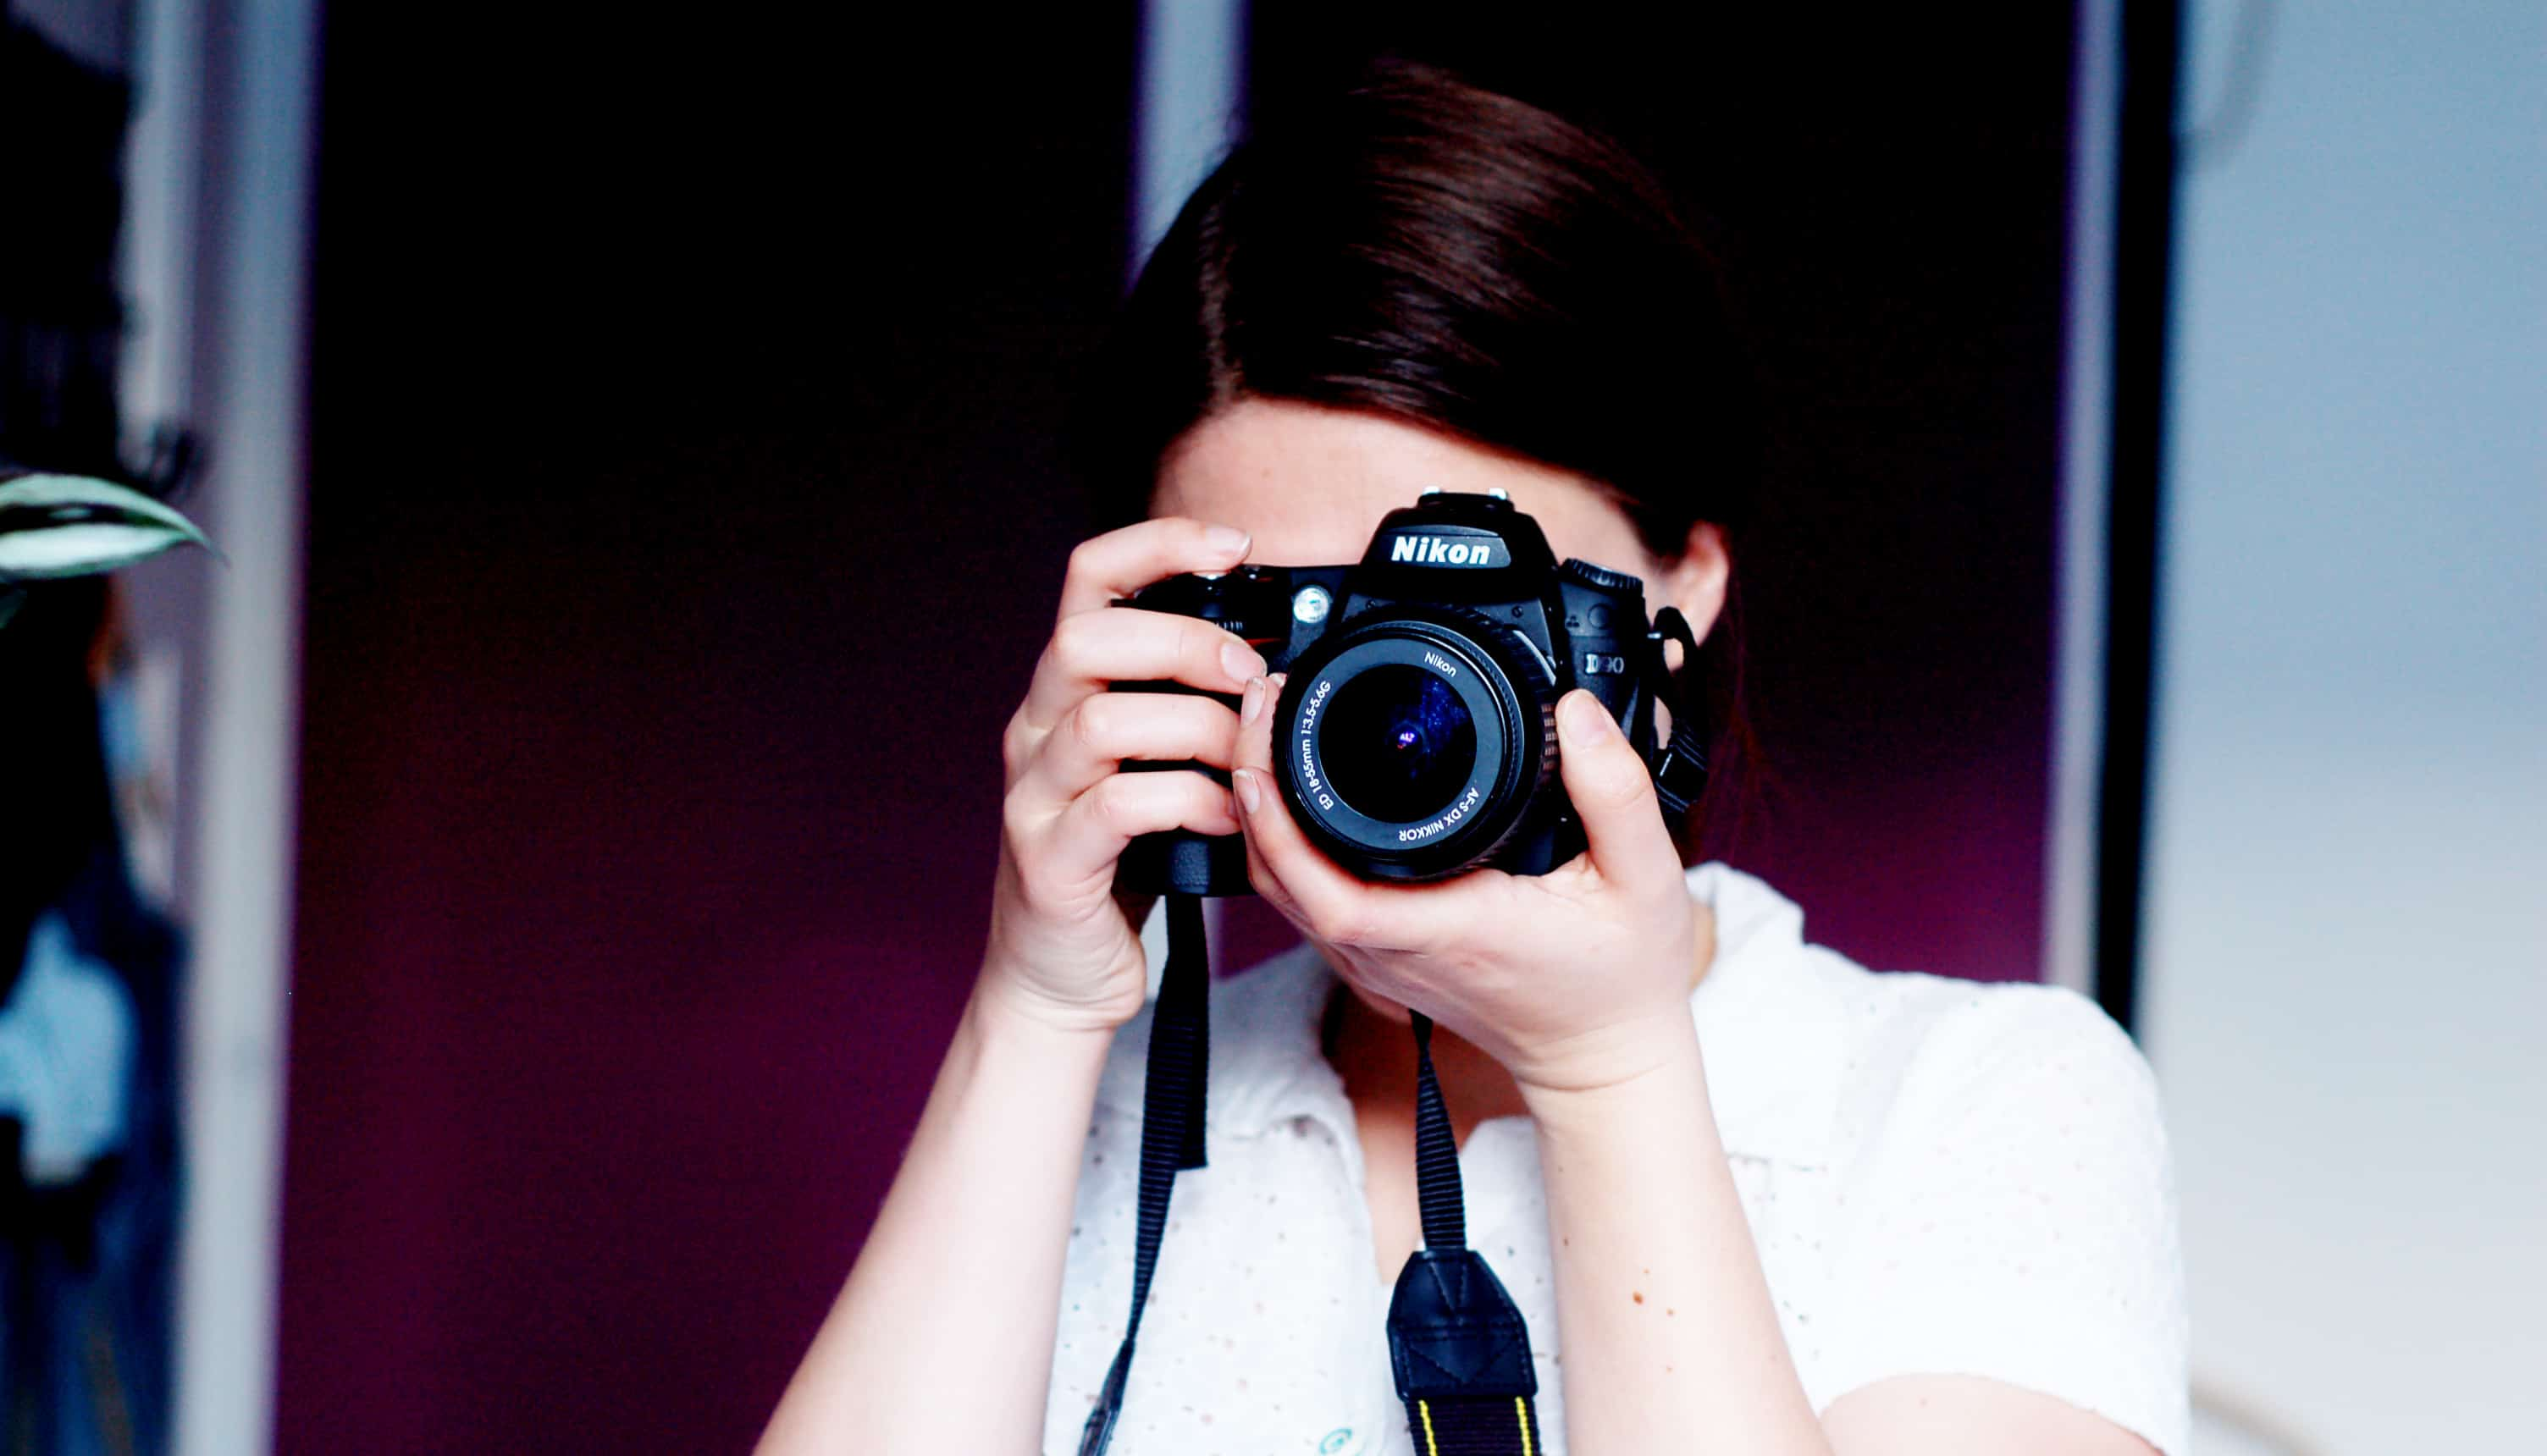 Me taking a photo